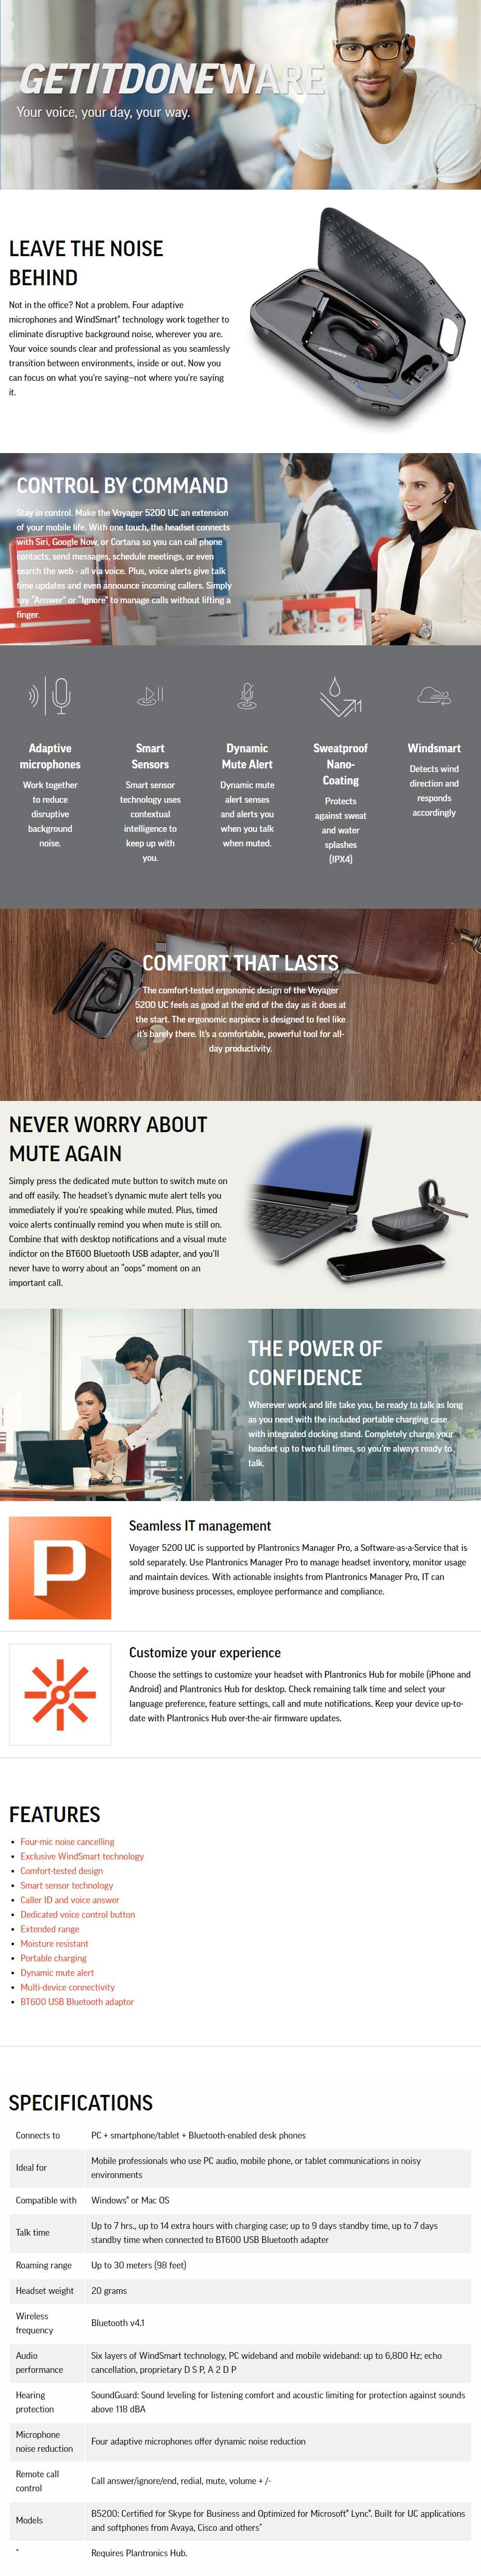 plantronics-voyager-5200-uc-noisaecancelling-bluetooth-headset-ac27244-3.jpg